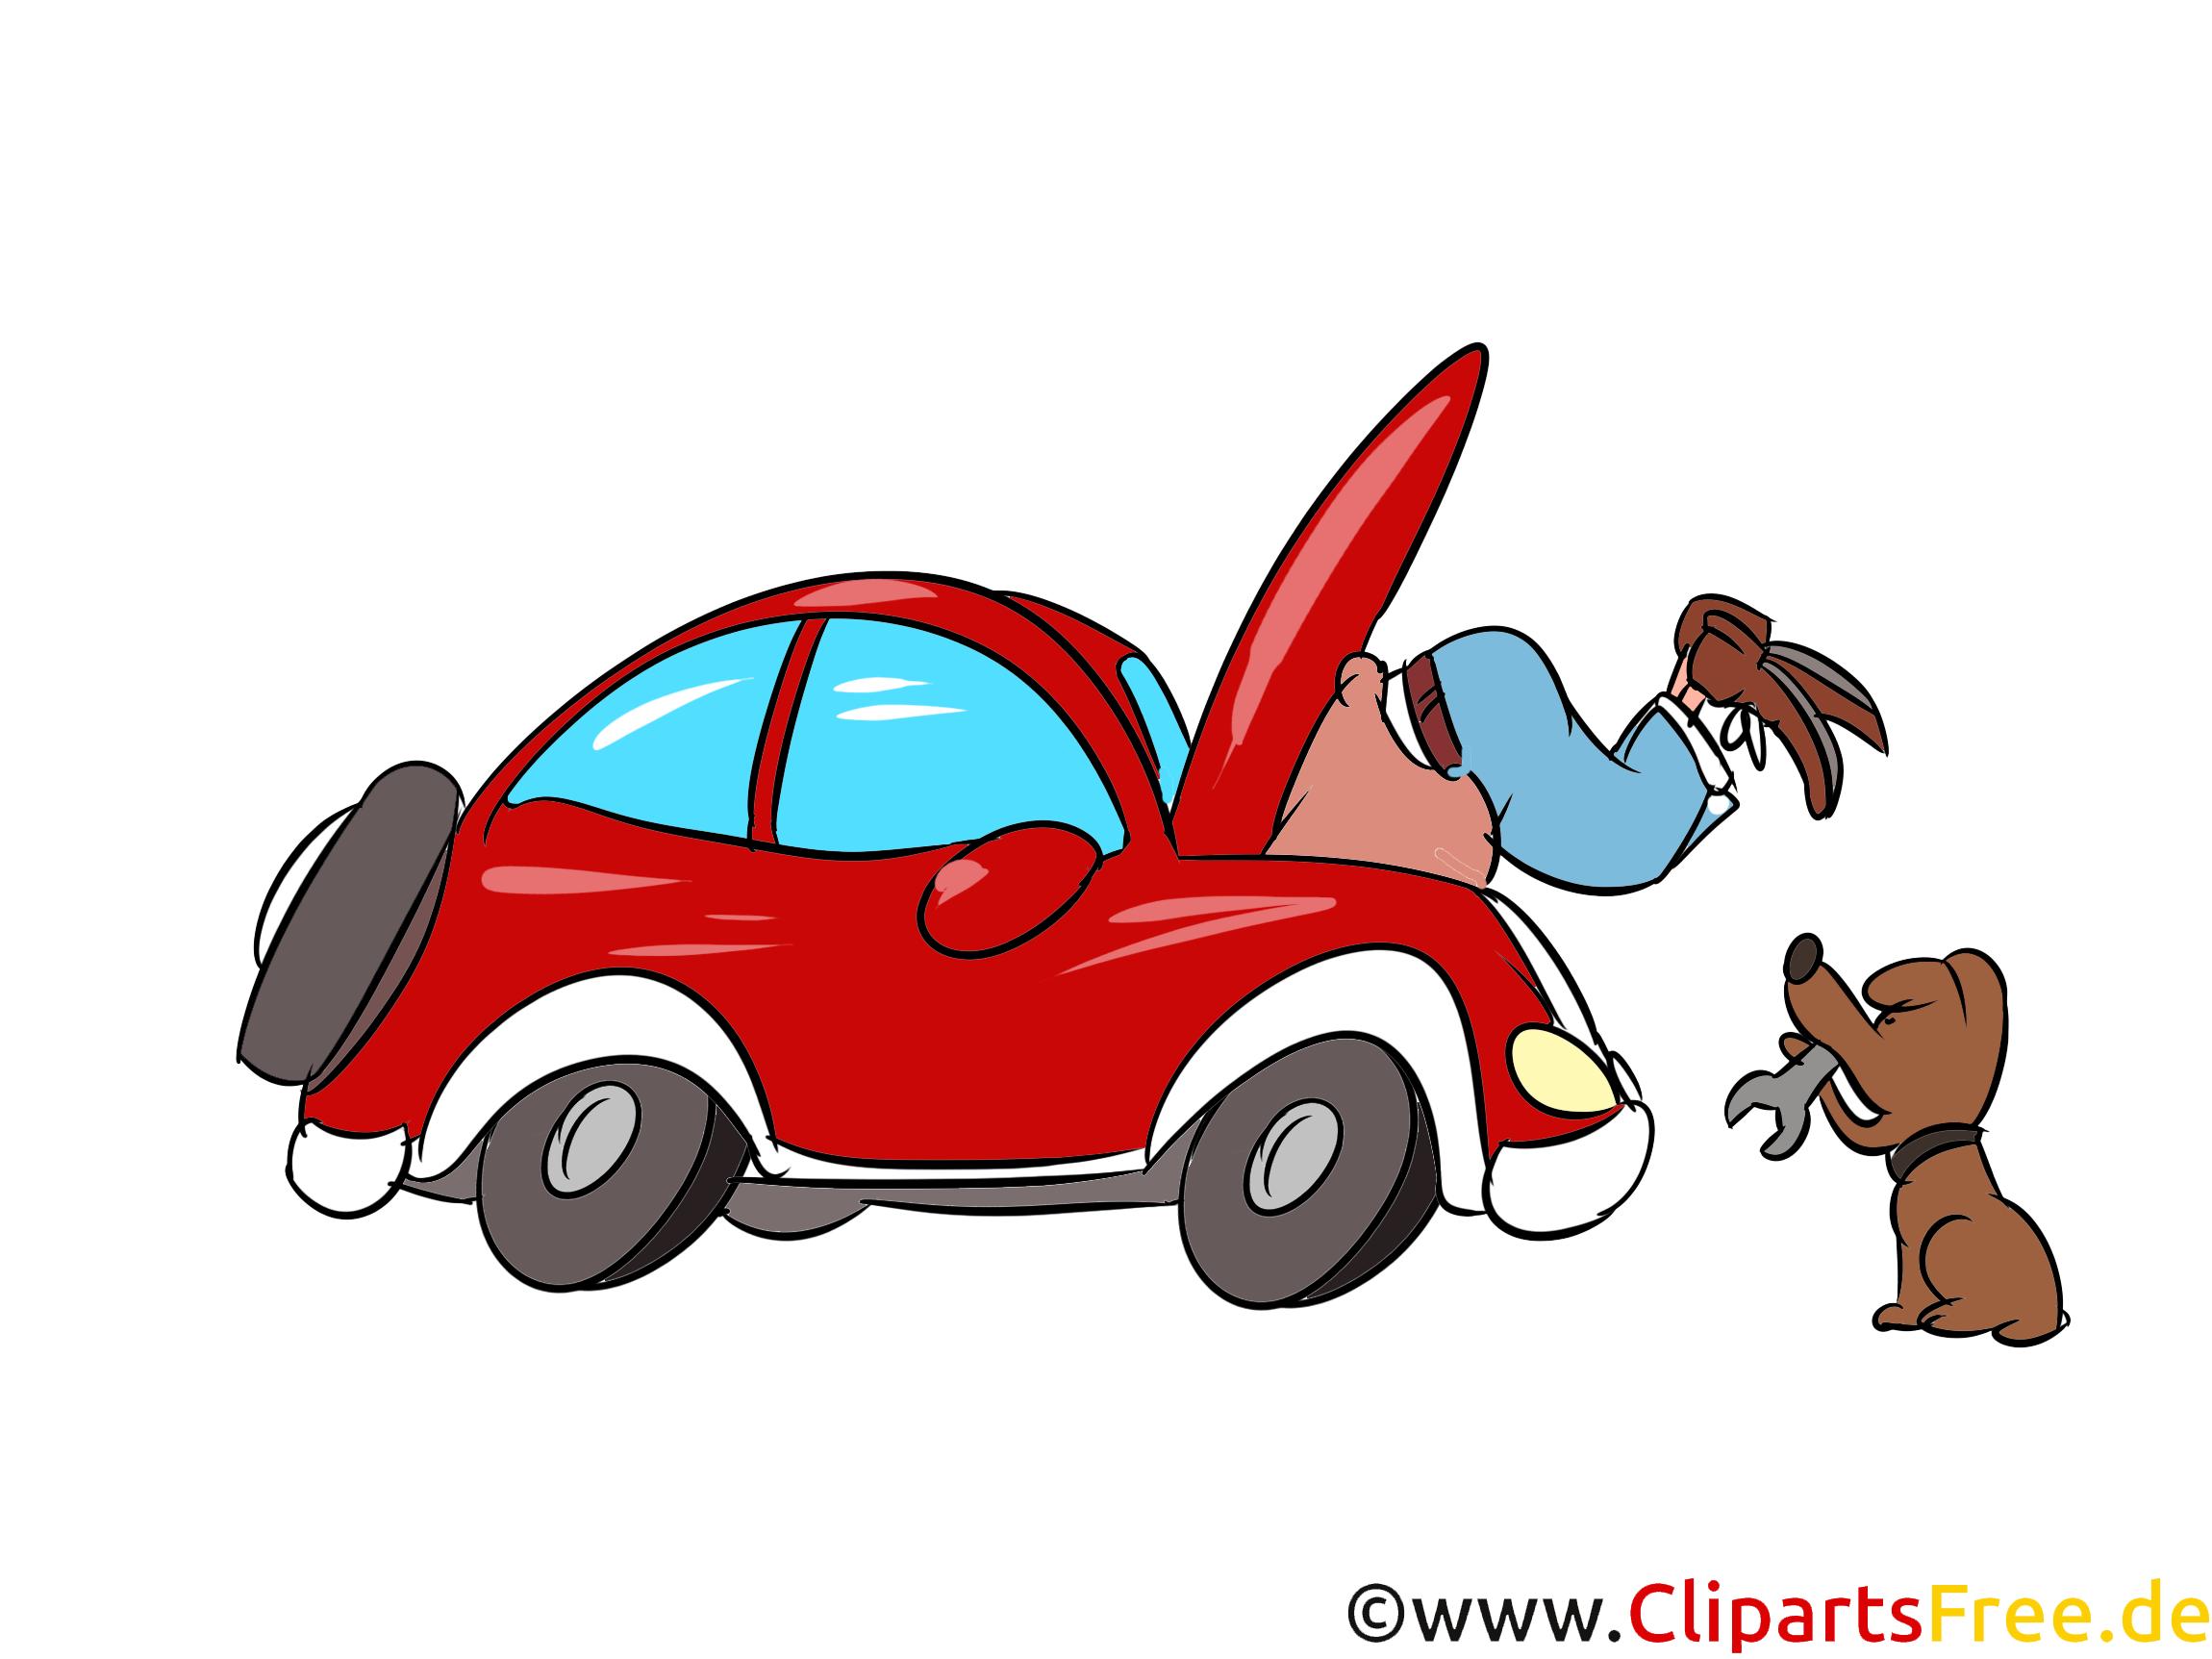 Auto selbst reparieren Bild, Illustration, Clipart, Cartoon gratis